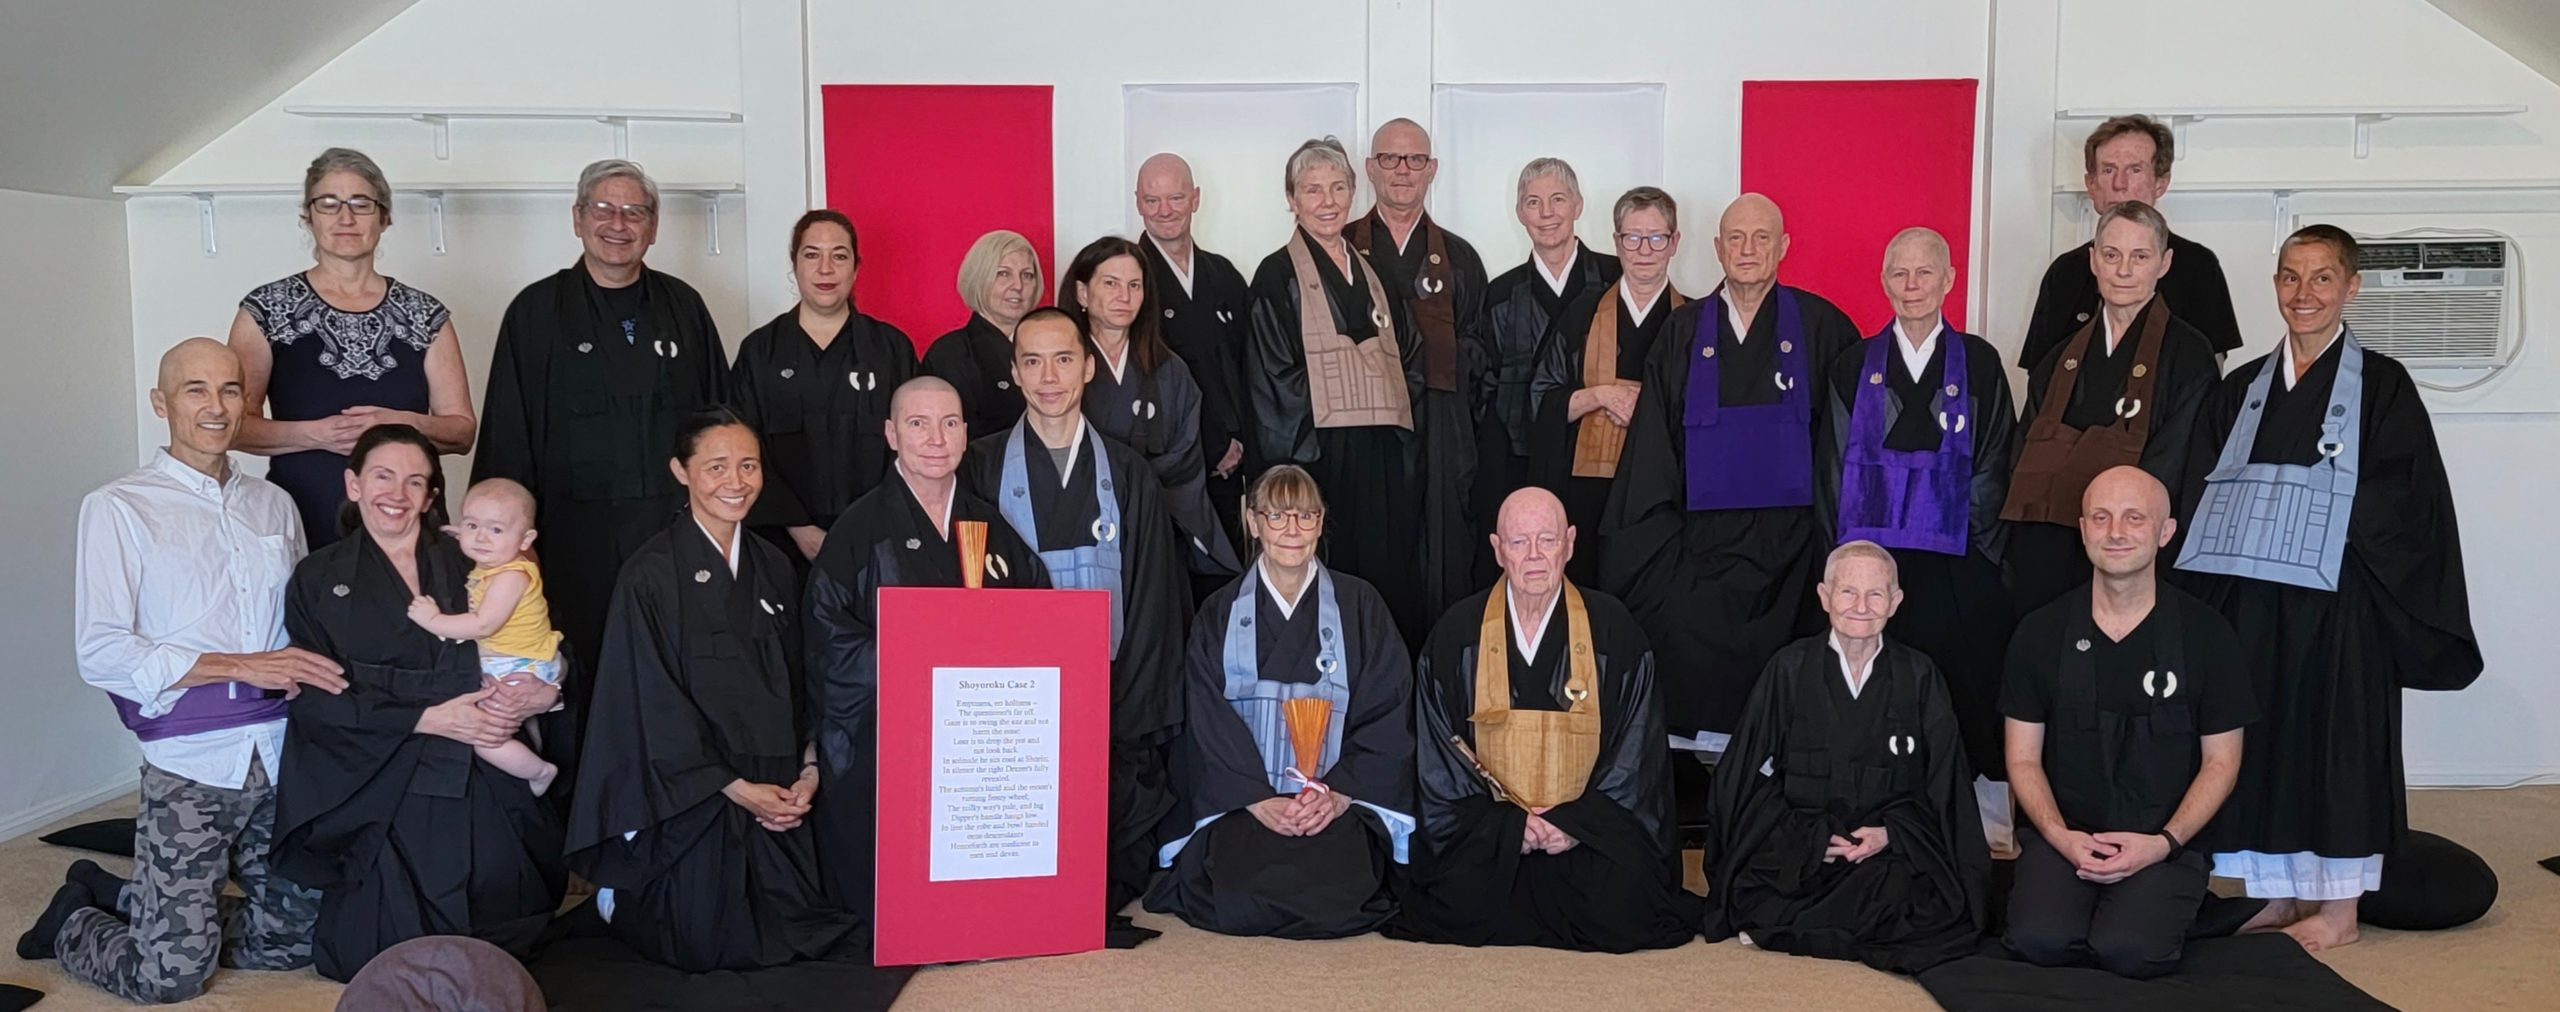 Sangha Group Photo